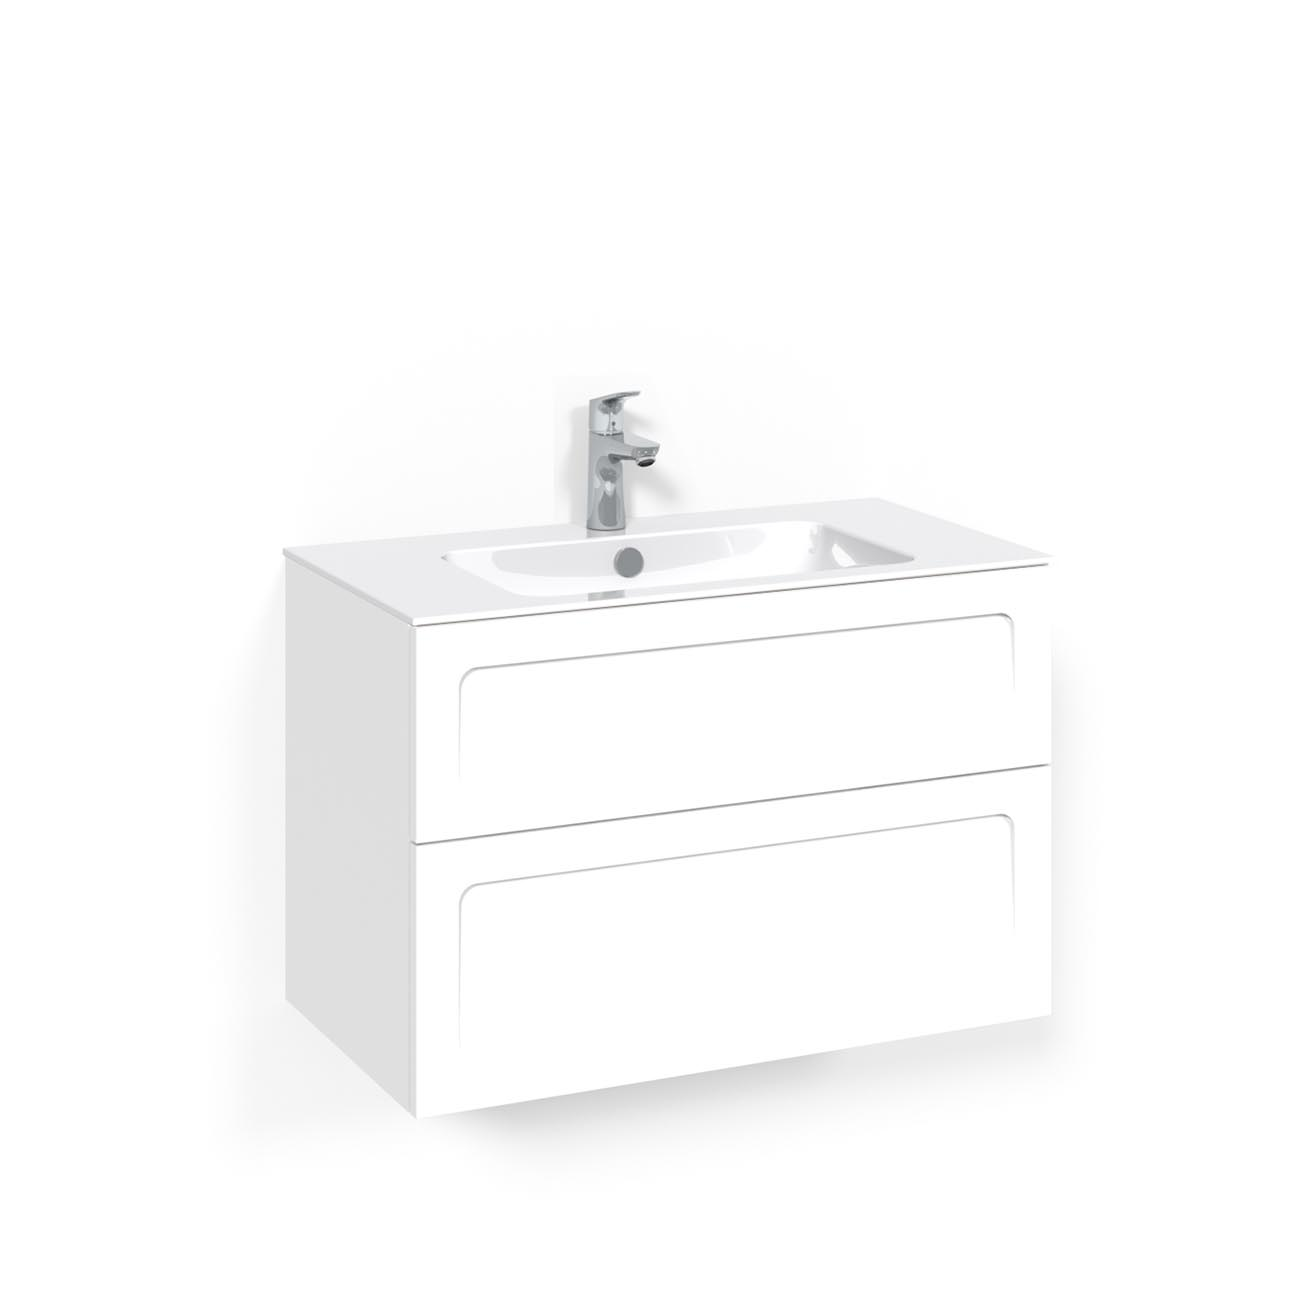 Tvättställsskåp Macro Design Crown Ramlucka Light 8